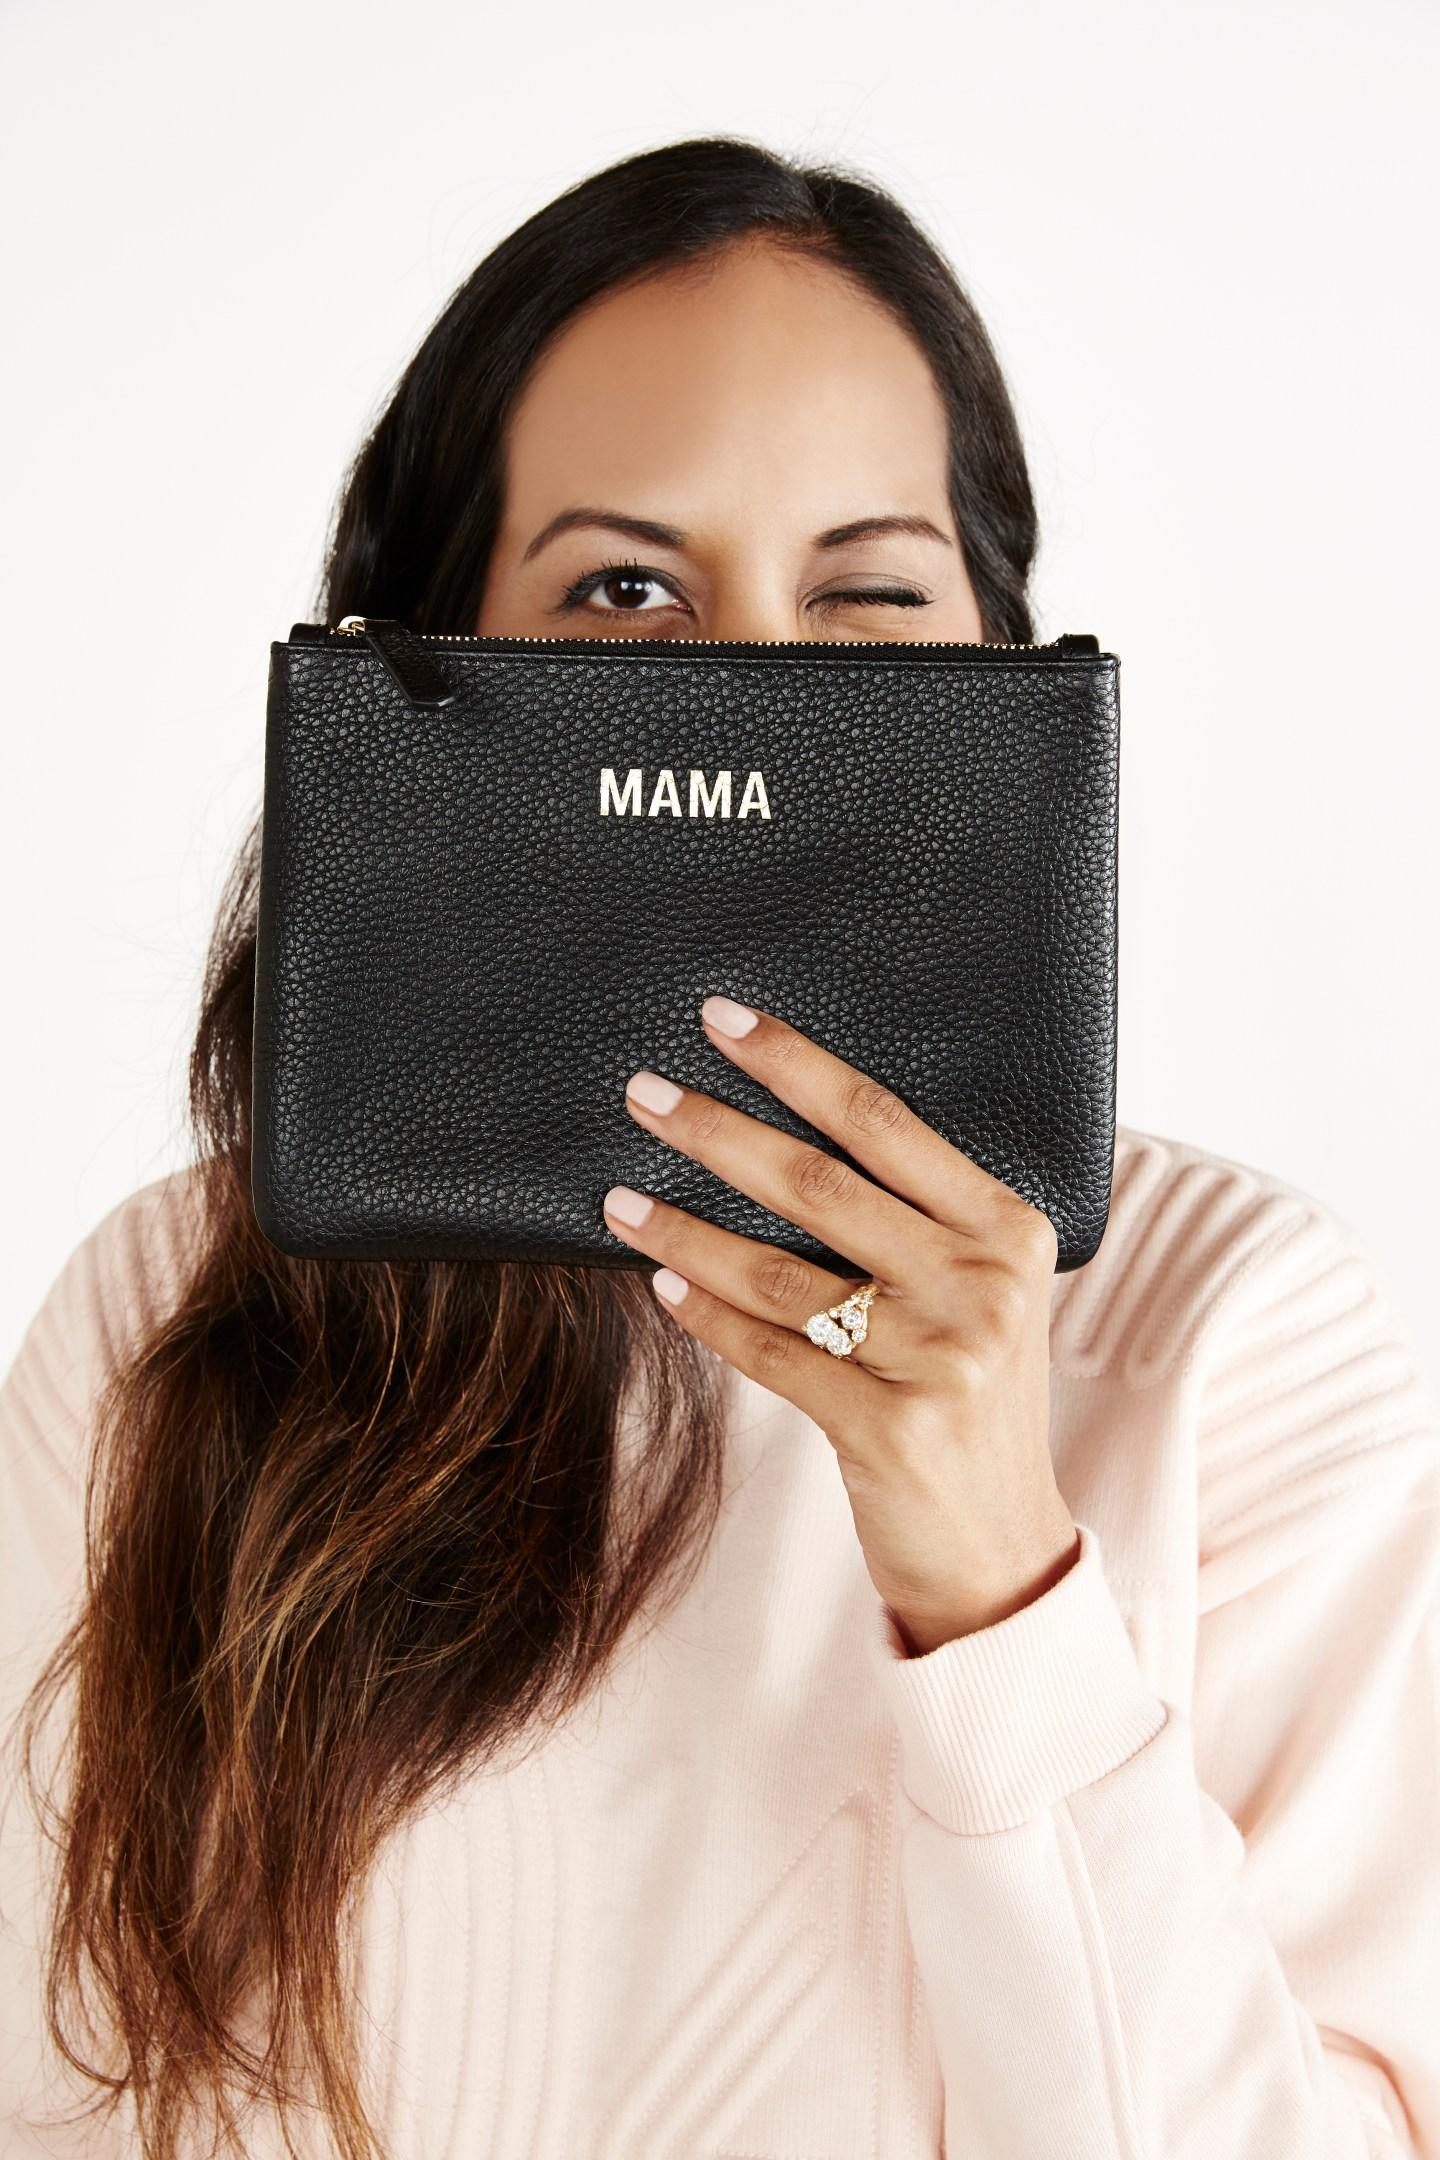 Jem + Bea MAMA pouch